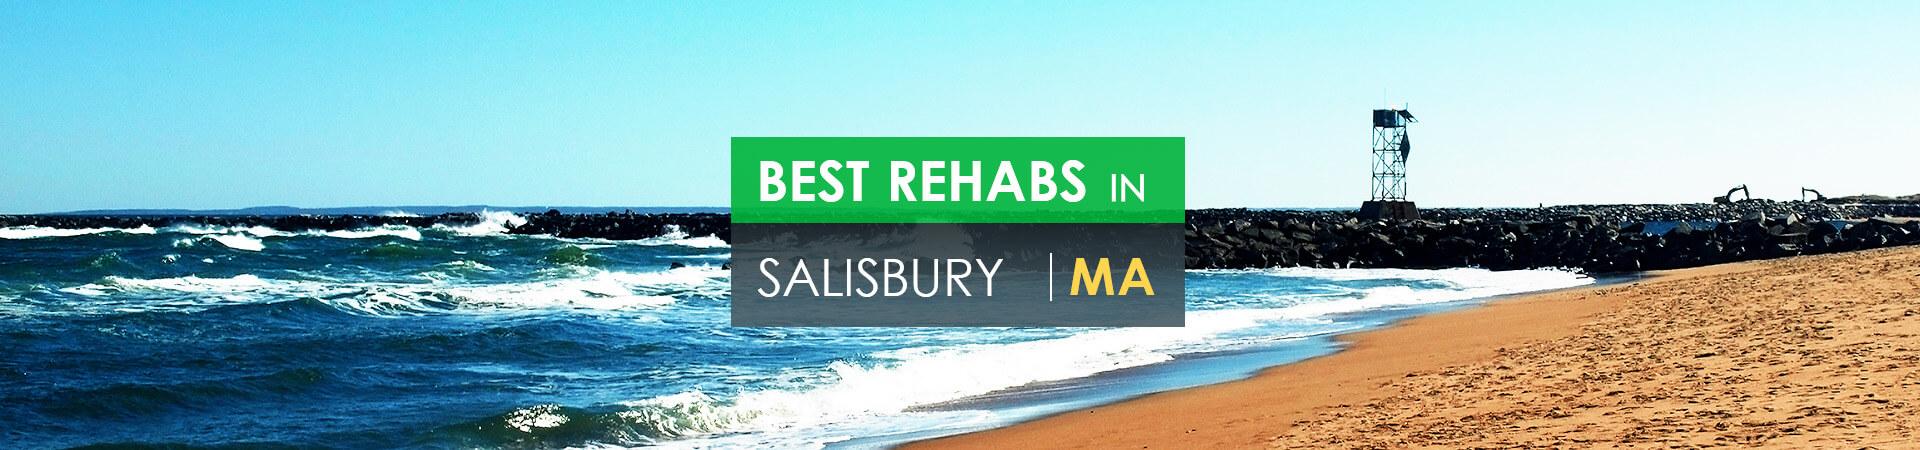 Best rehabs in Salisbury, MA